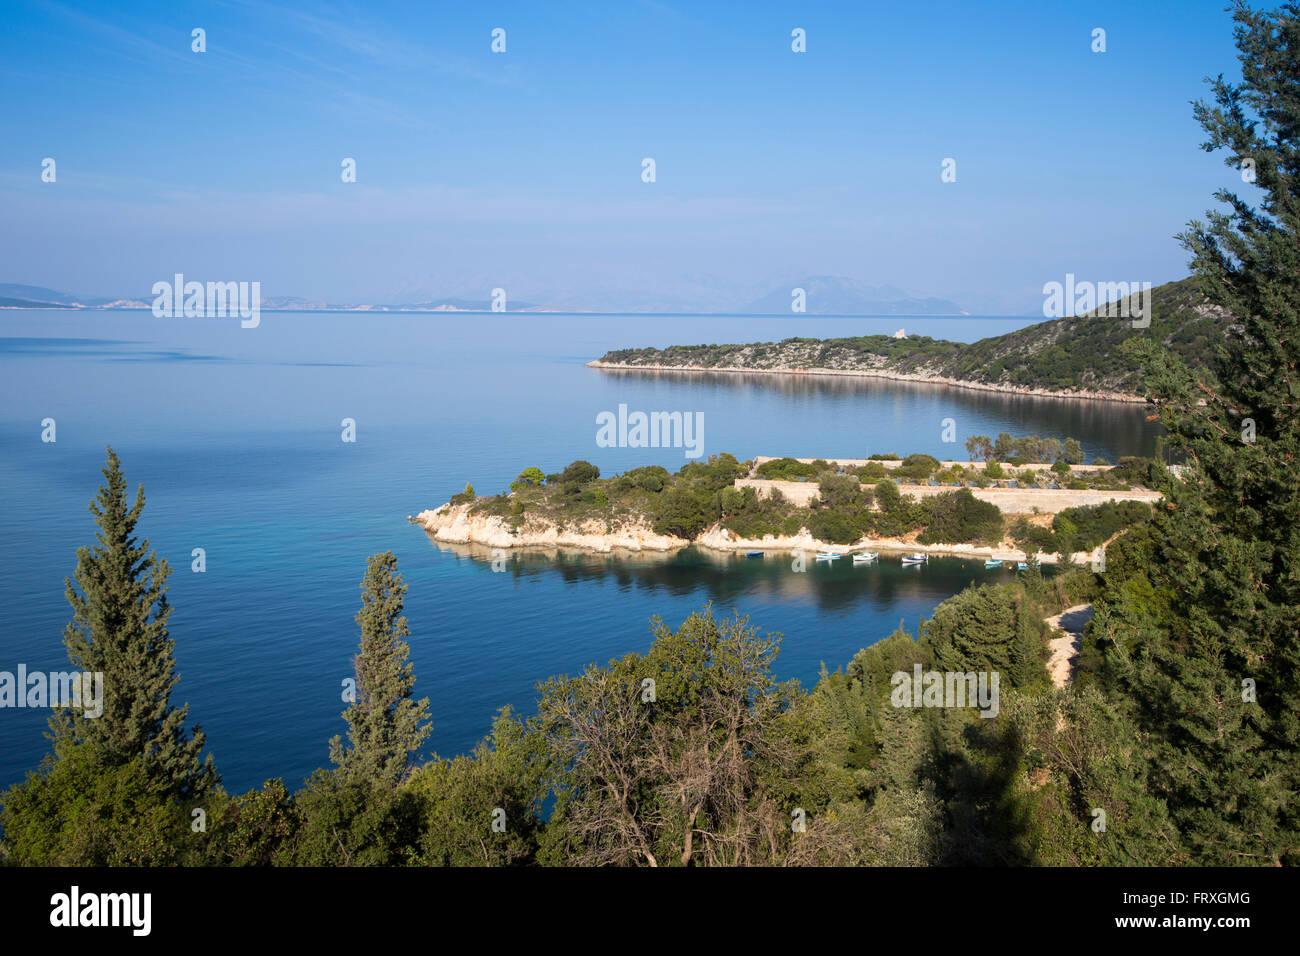 Pristine coastline, near Frikes, Ithaca, Ionian Islands, Greece - Stock Image